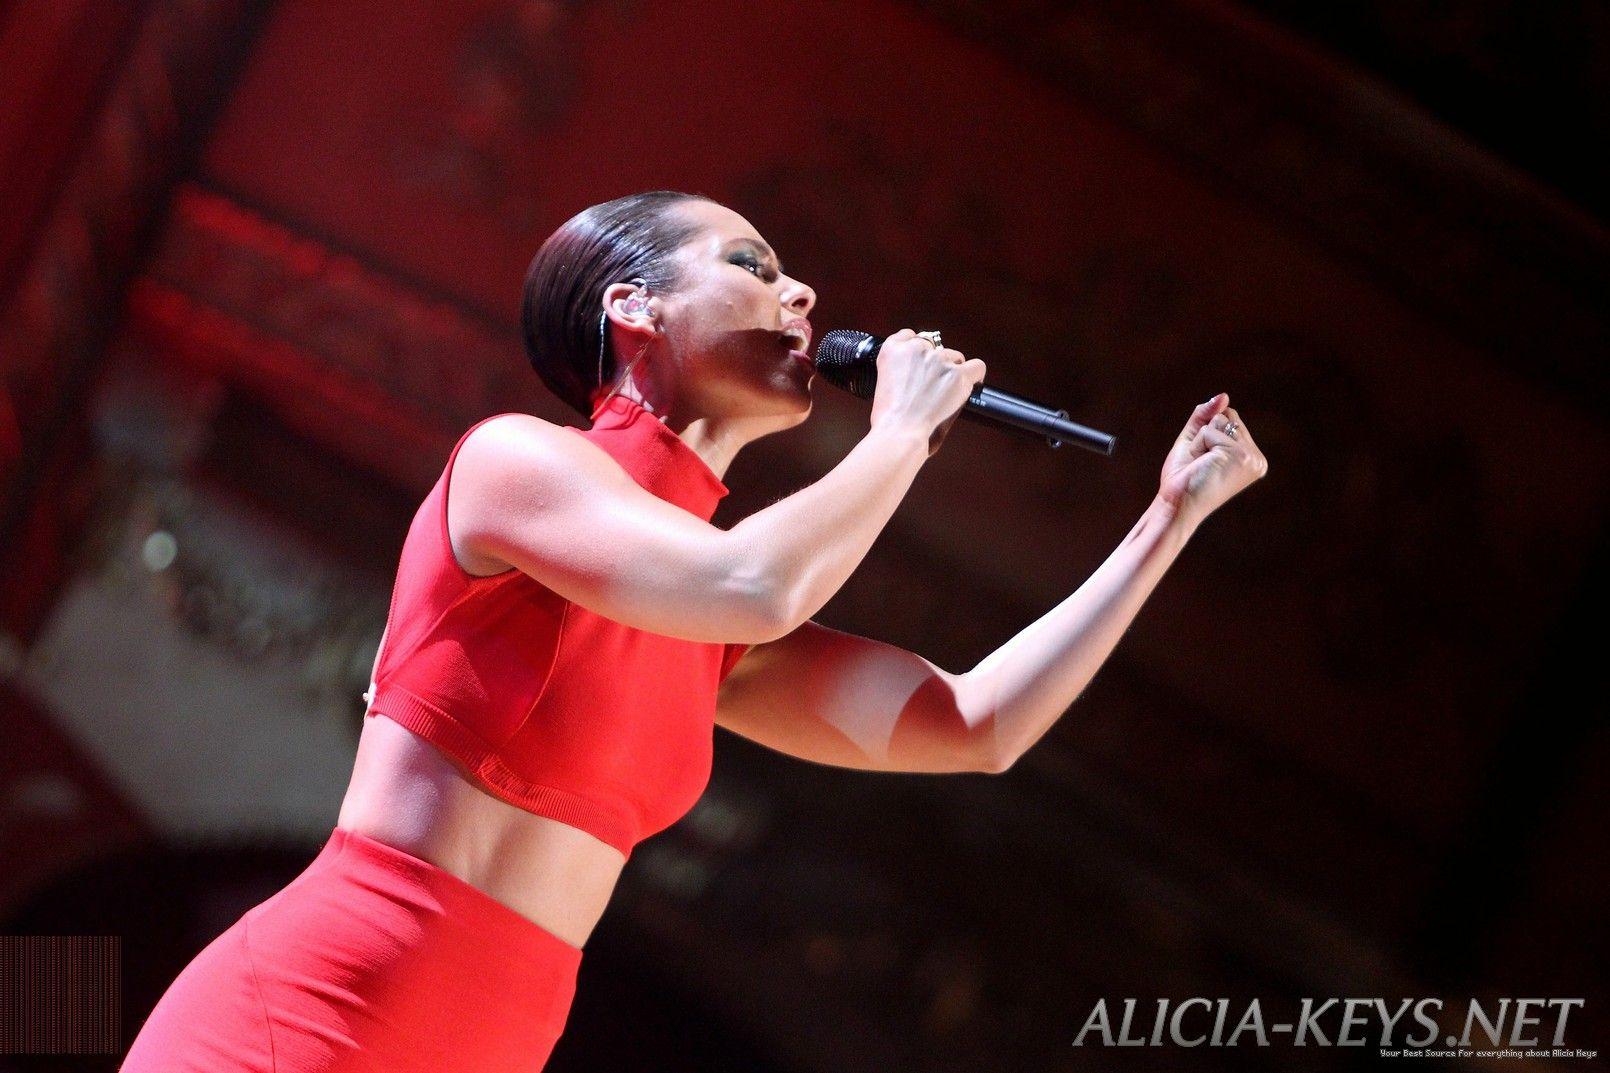 BET Honors January 12 09 Alicia Keys Online The